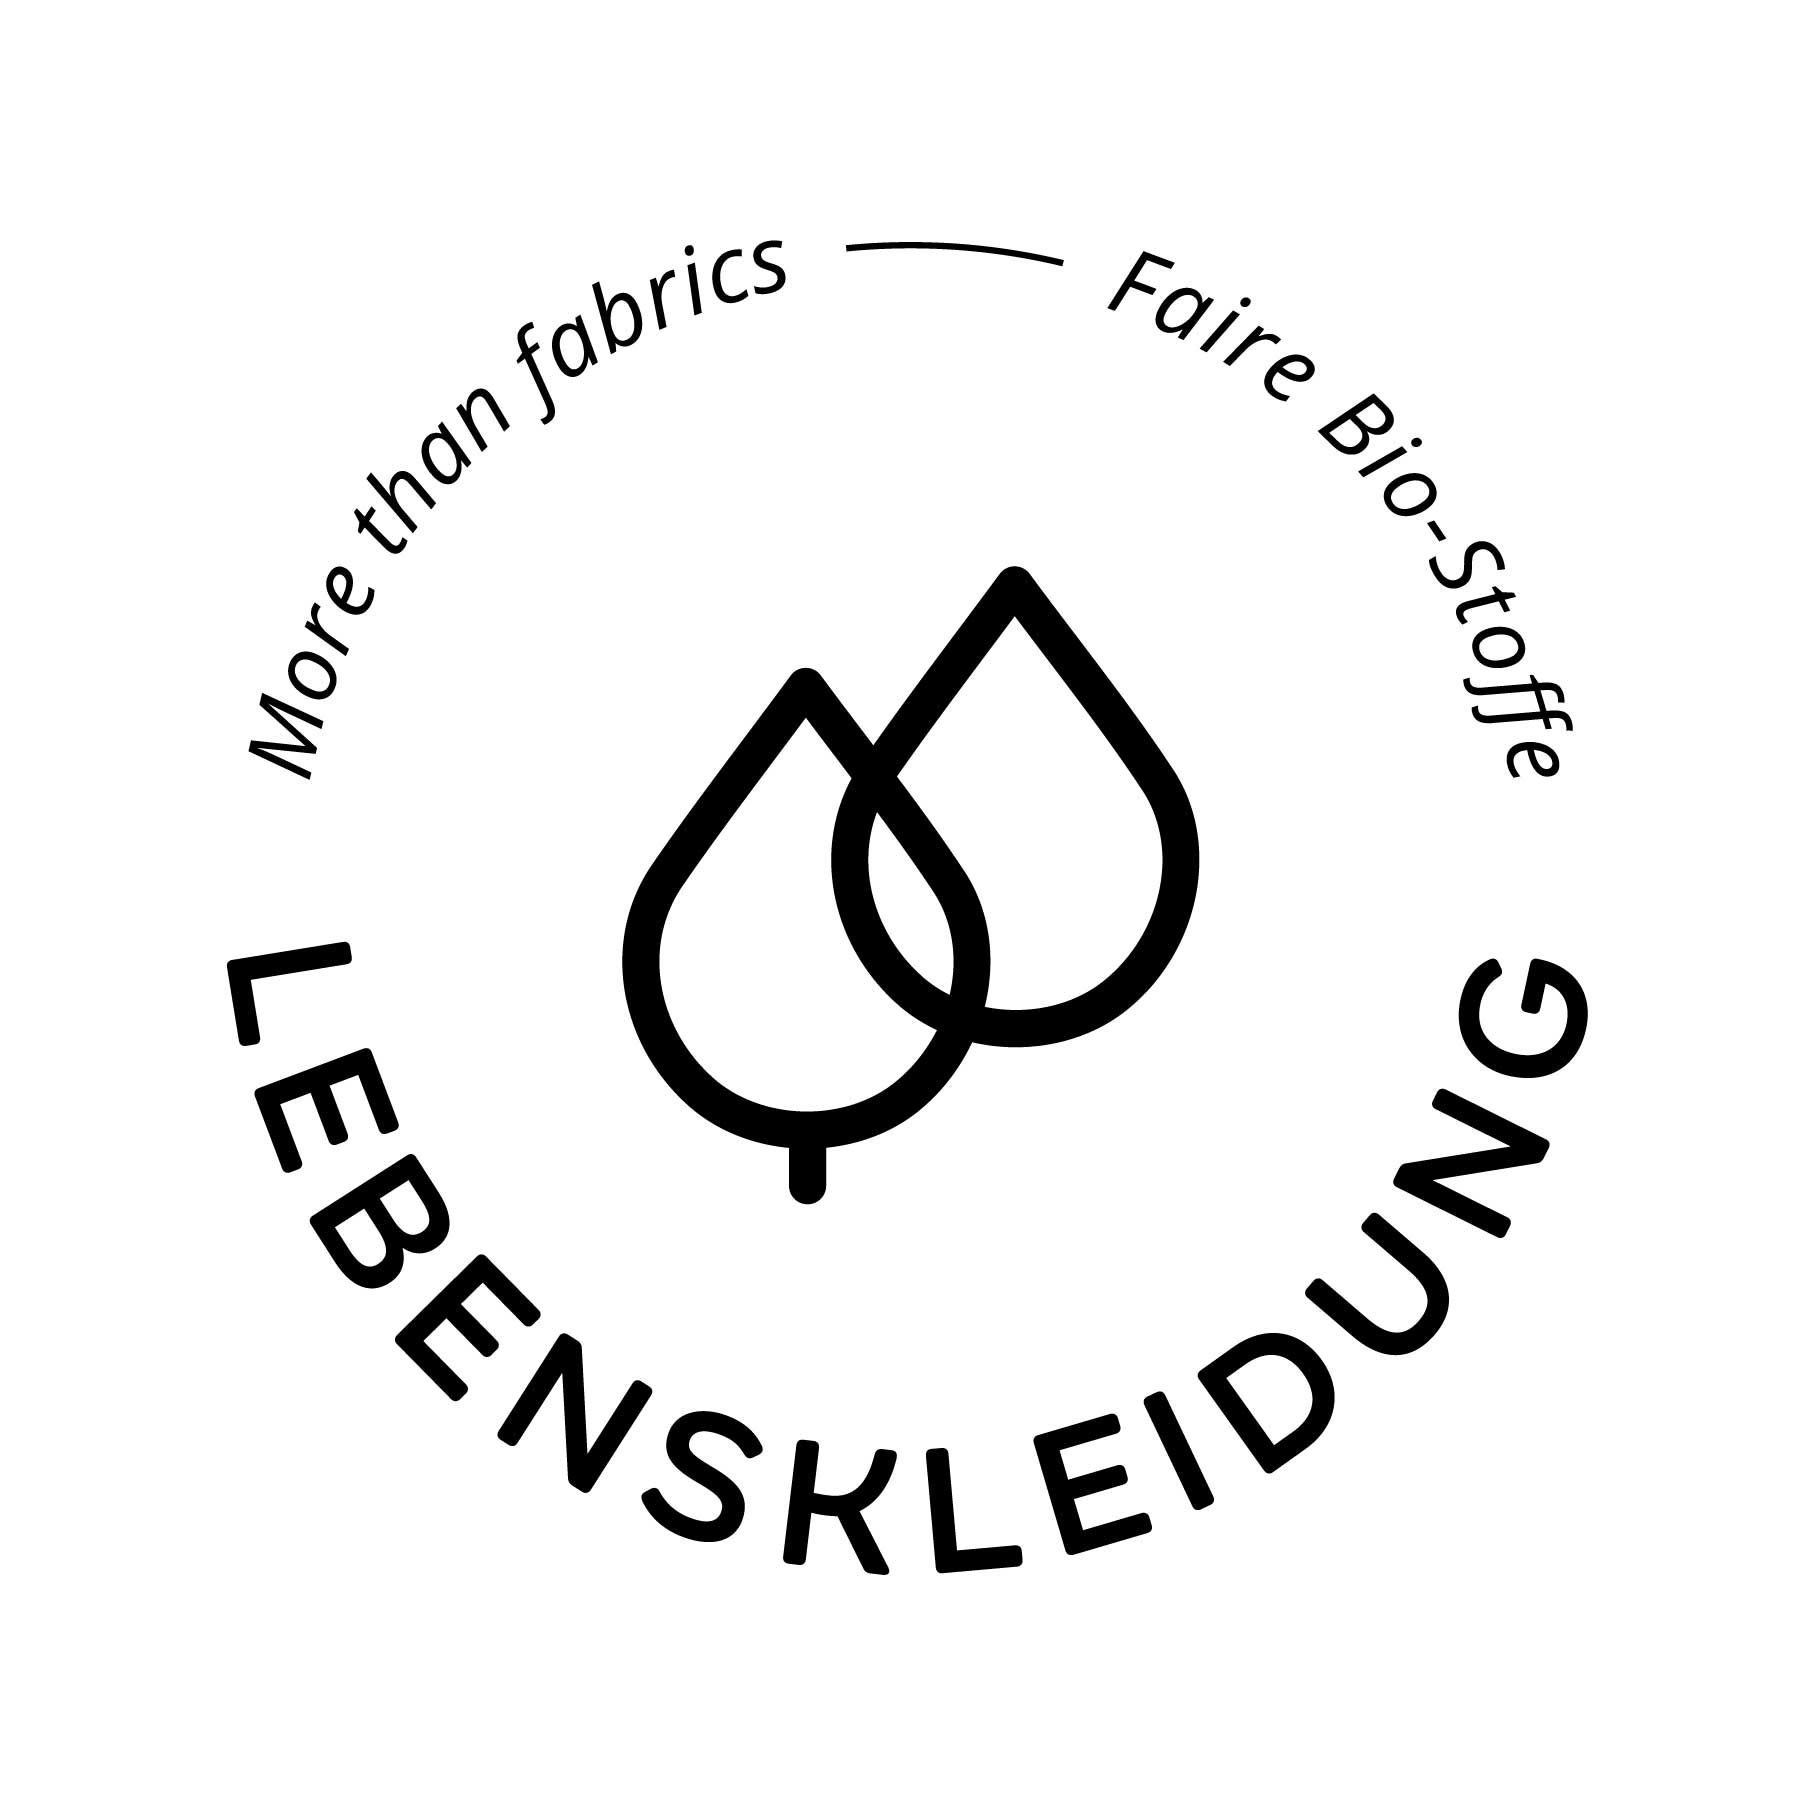 Bio Tessuto di Jersey elastico - Strisce larghe Ecru/Nero